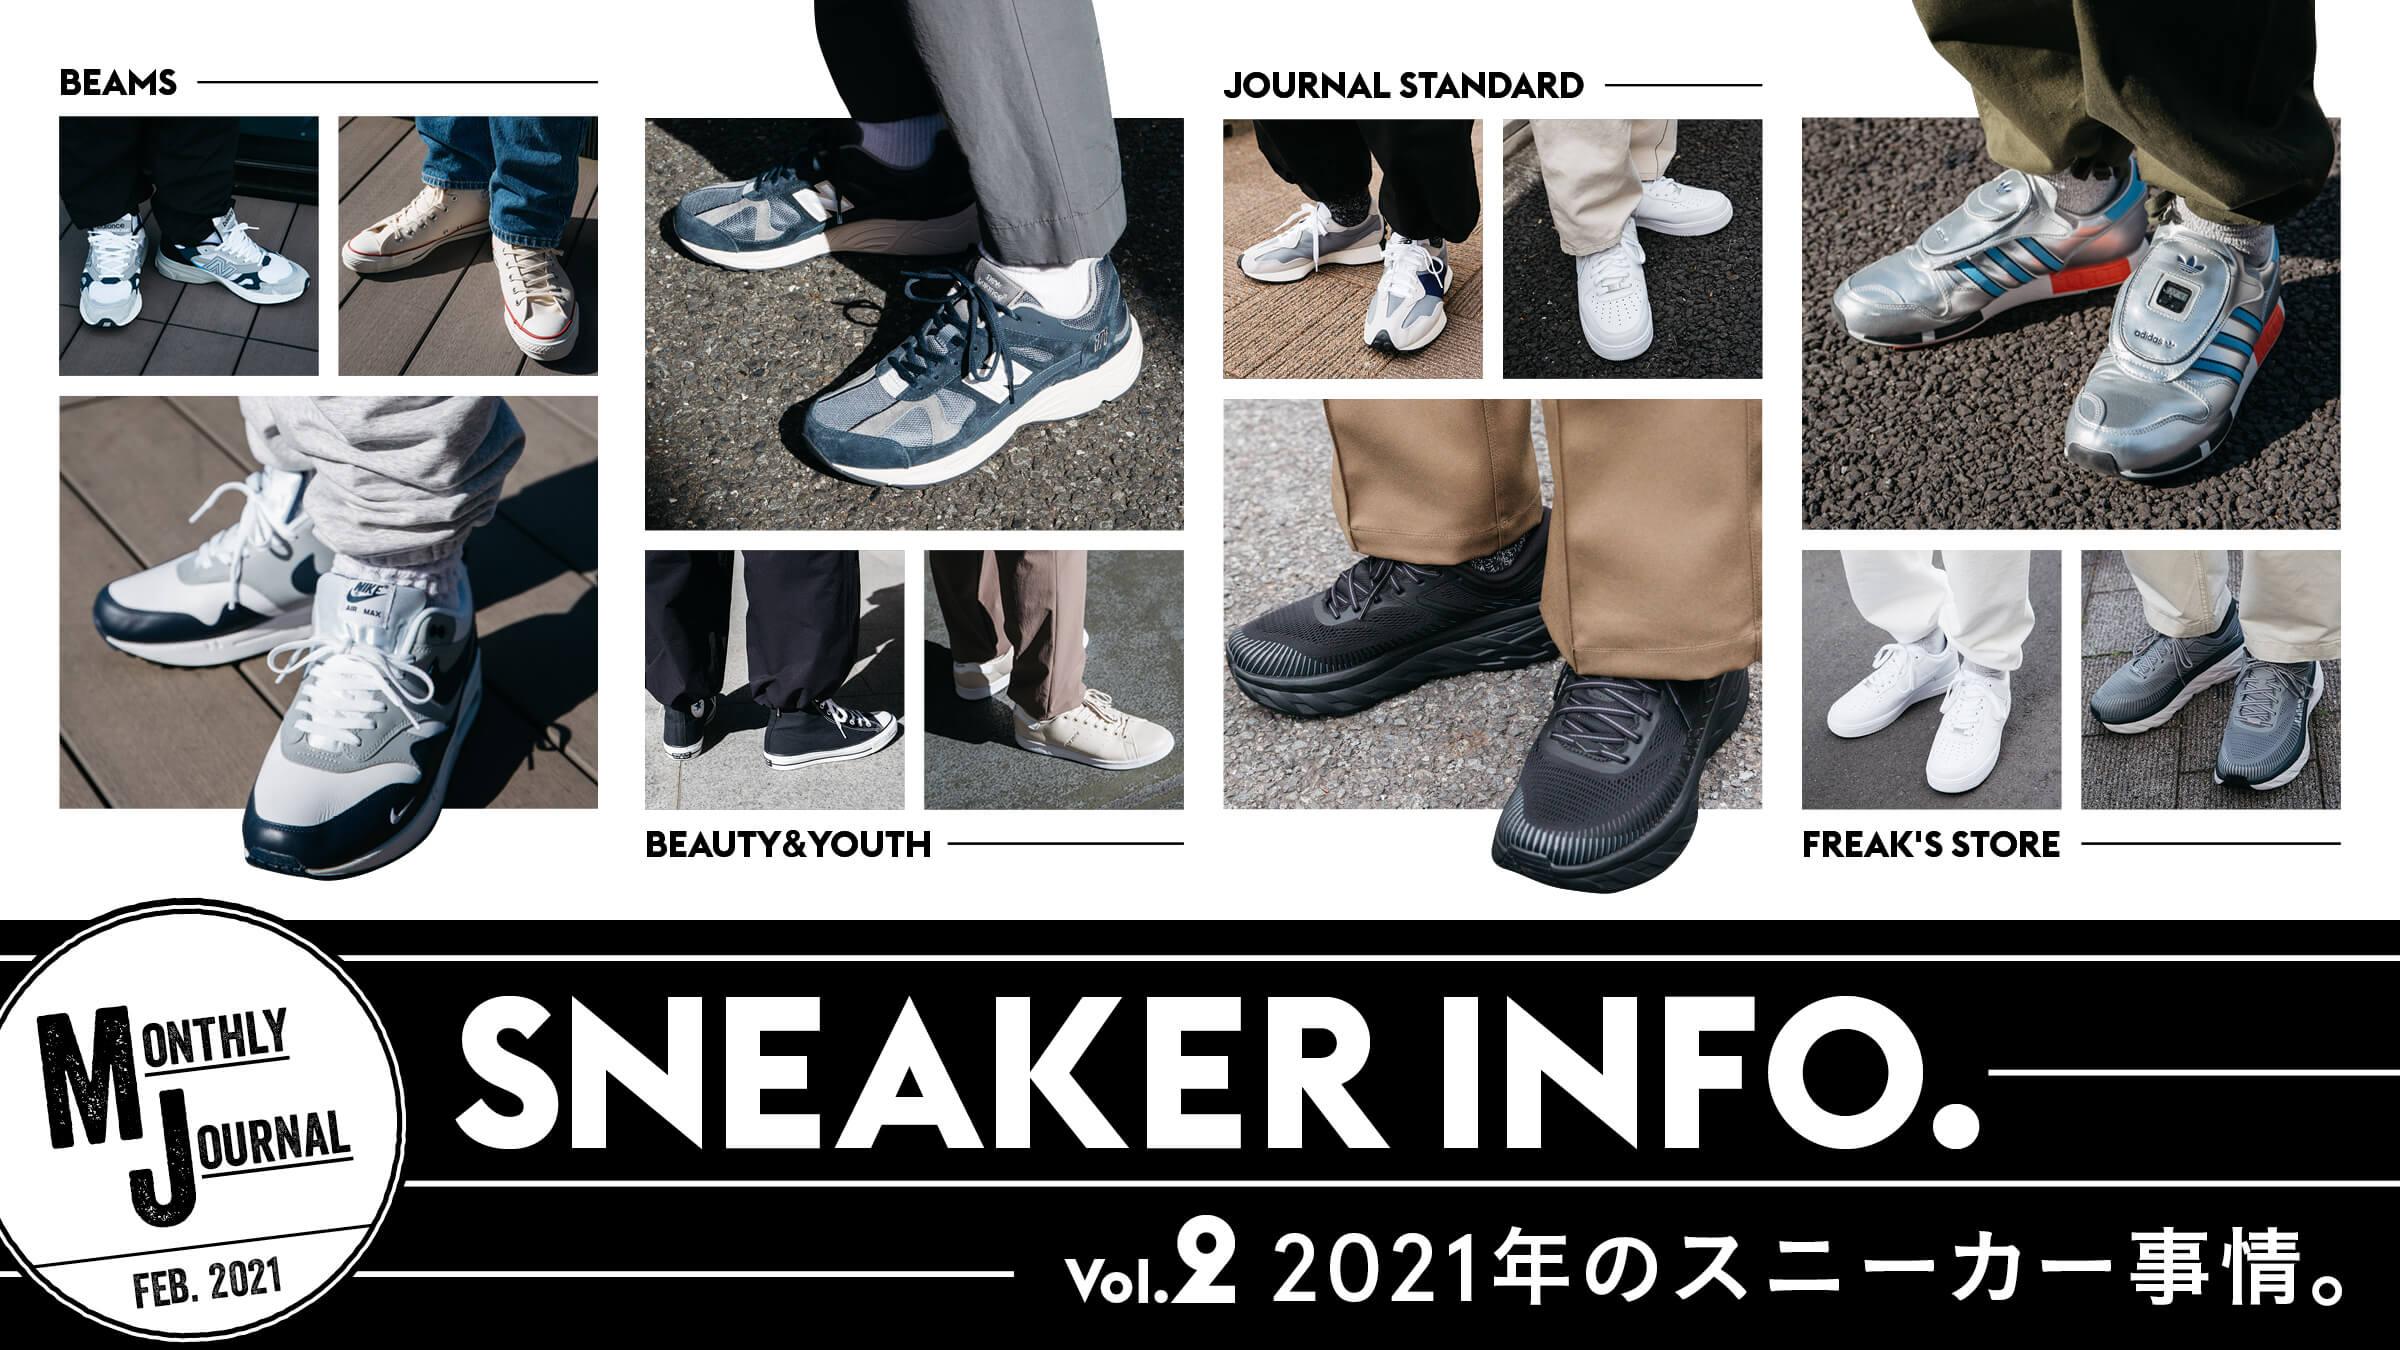 SNEAKER INFO. Vol.2 2021年のスニーカー事情。